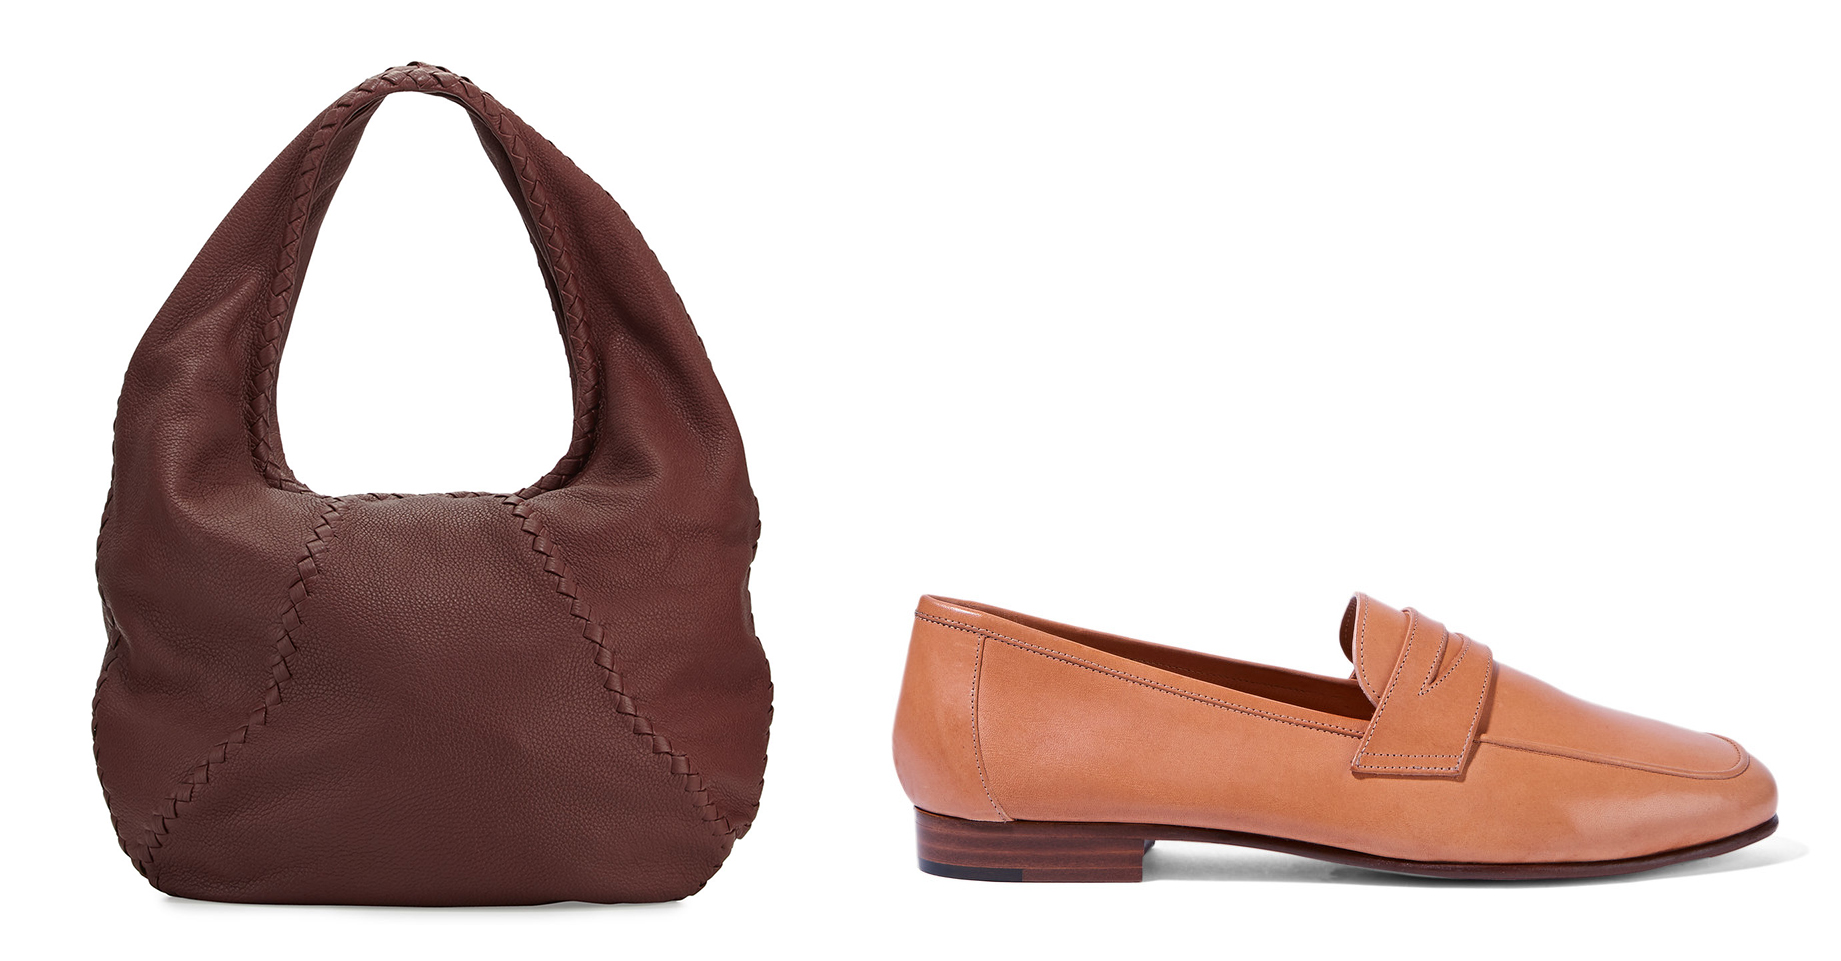 Bottega Veneta Cervo Large Leather Hobo Bag $1,780 via Neiman Marcus  Mansur Gavriel Leather Loafers $425 via Net-a-Porter